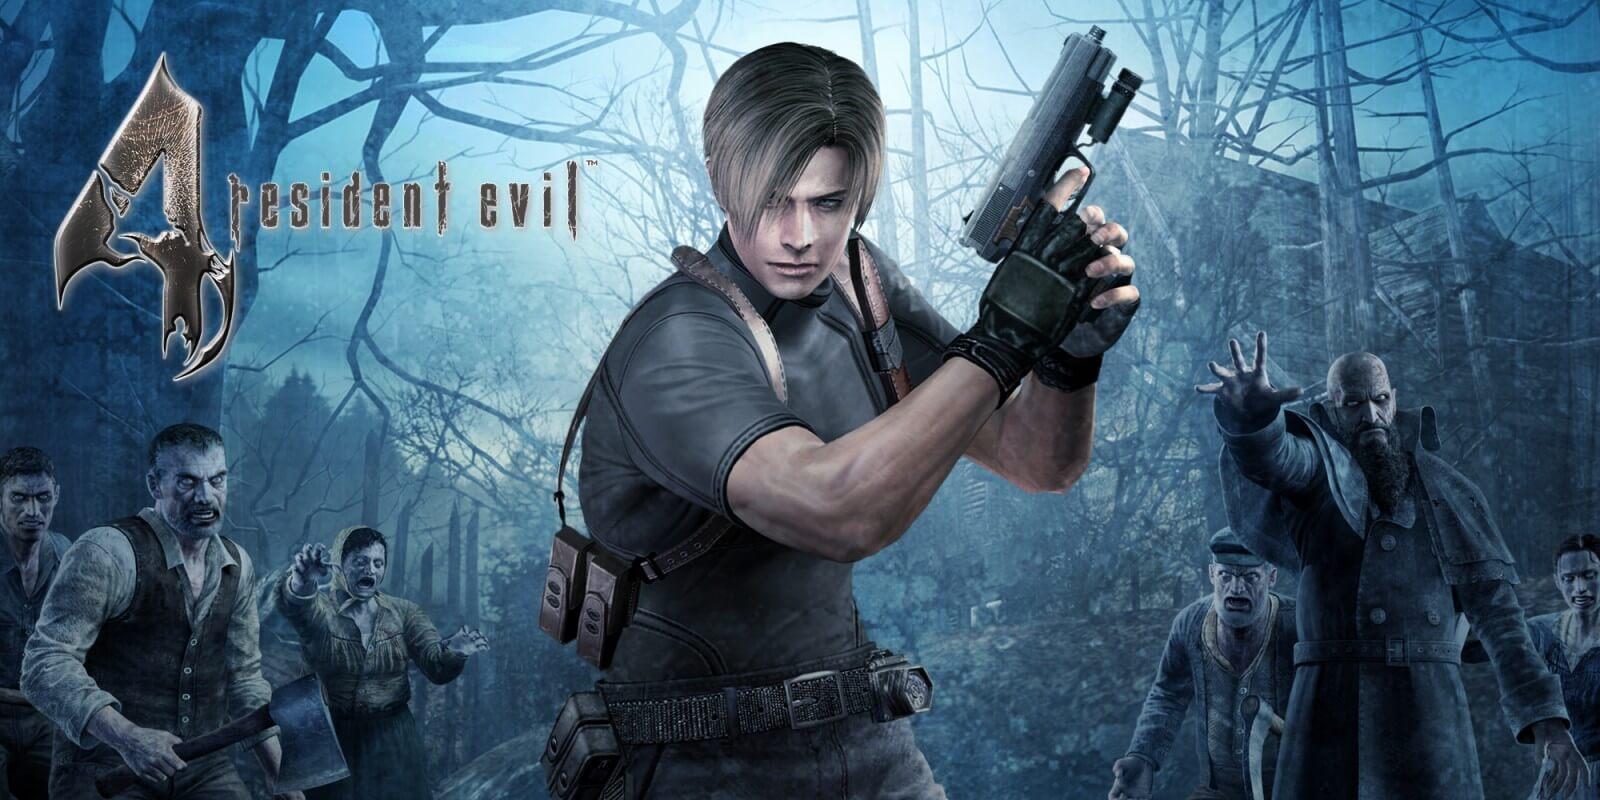 Resident Evil 4 Apk v1 01 01 Download - RoboModo